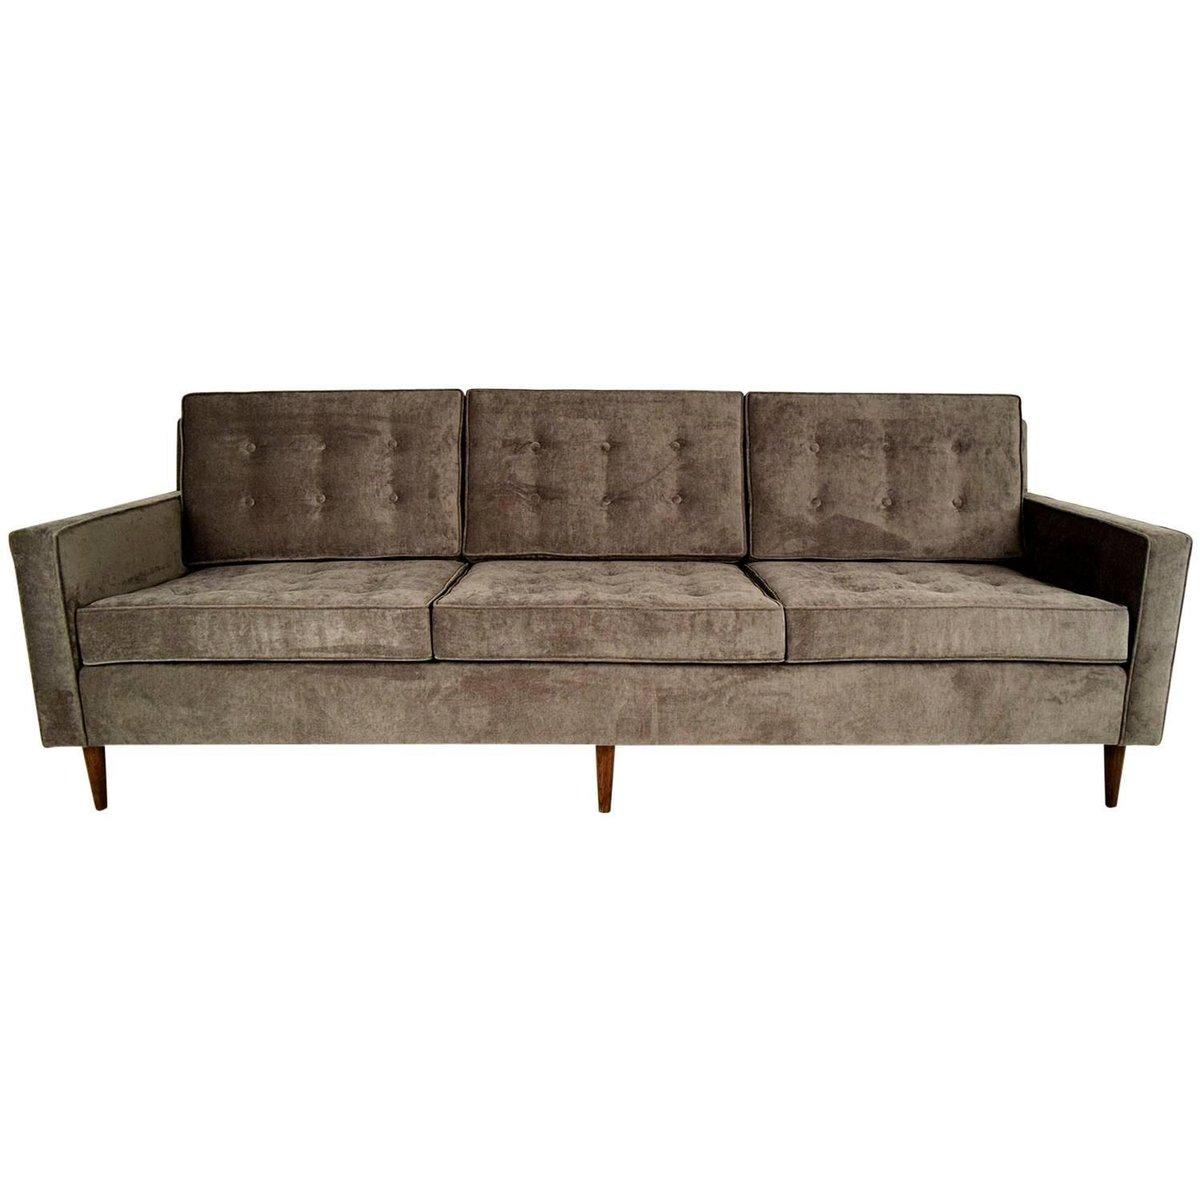 mid century 3 sitzer sofa 1960er bei pamono kaufen. Black Bedroom Furniture Sets. Home Design Ideas